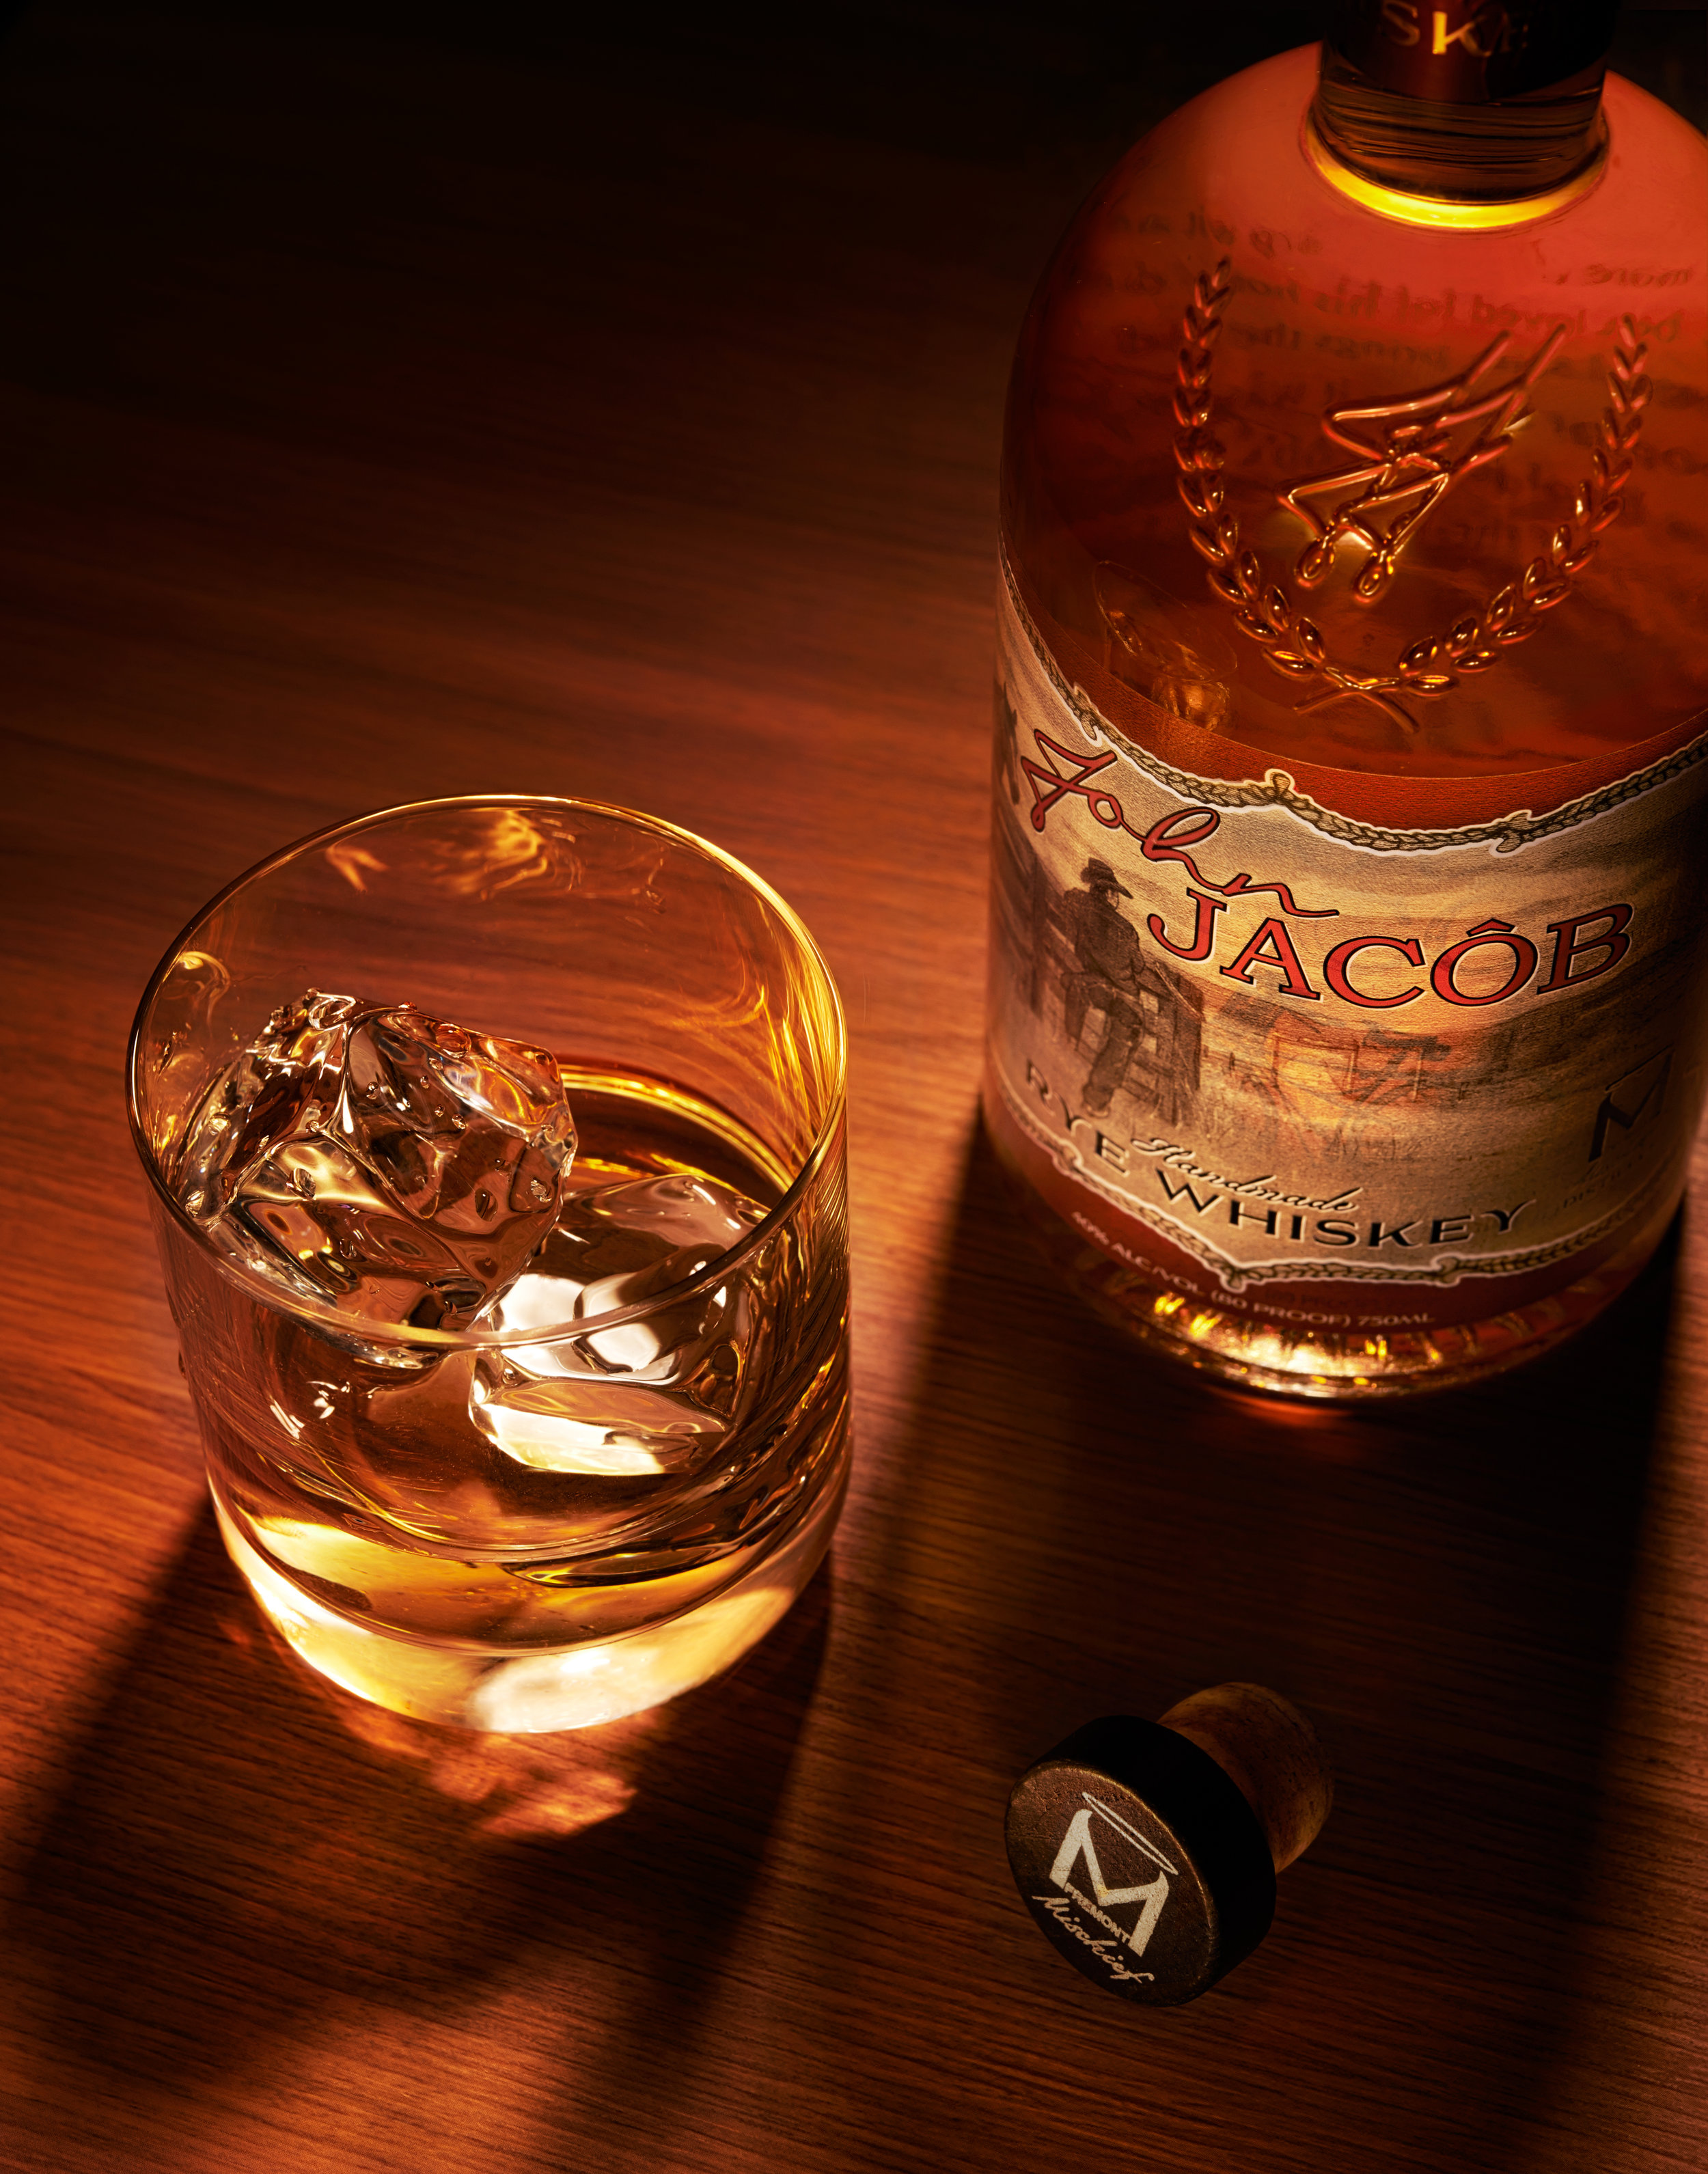 john-jacob-whiskey.jpg